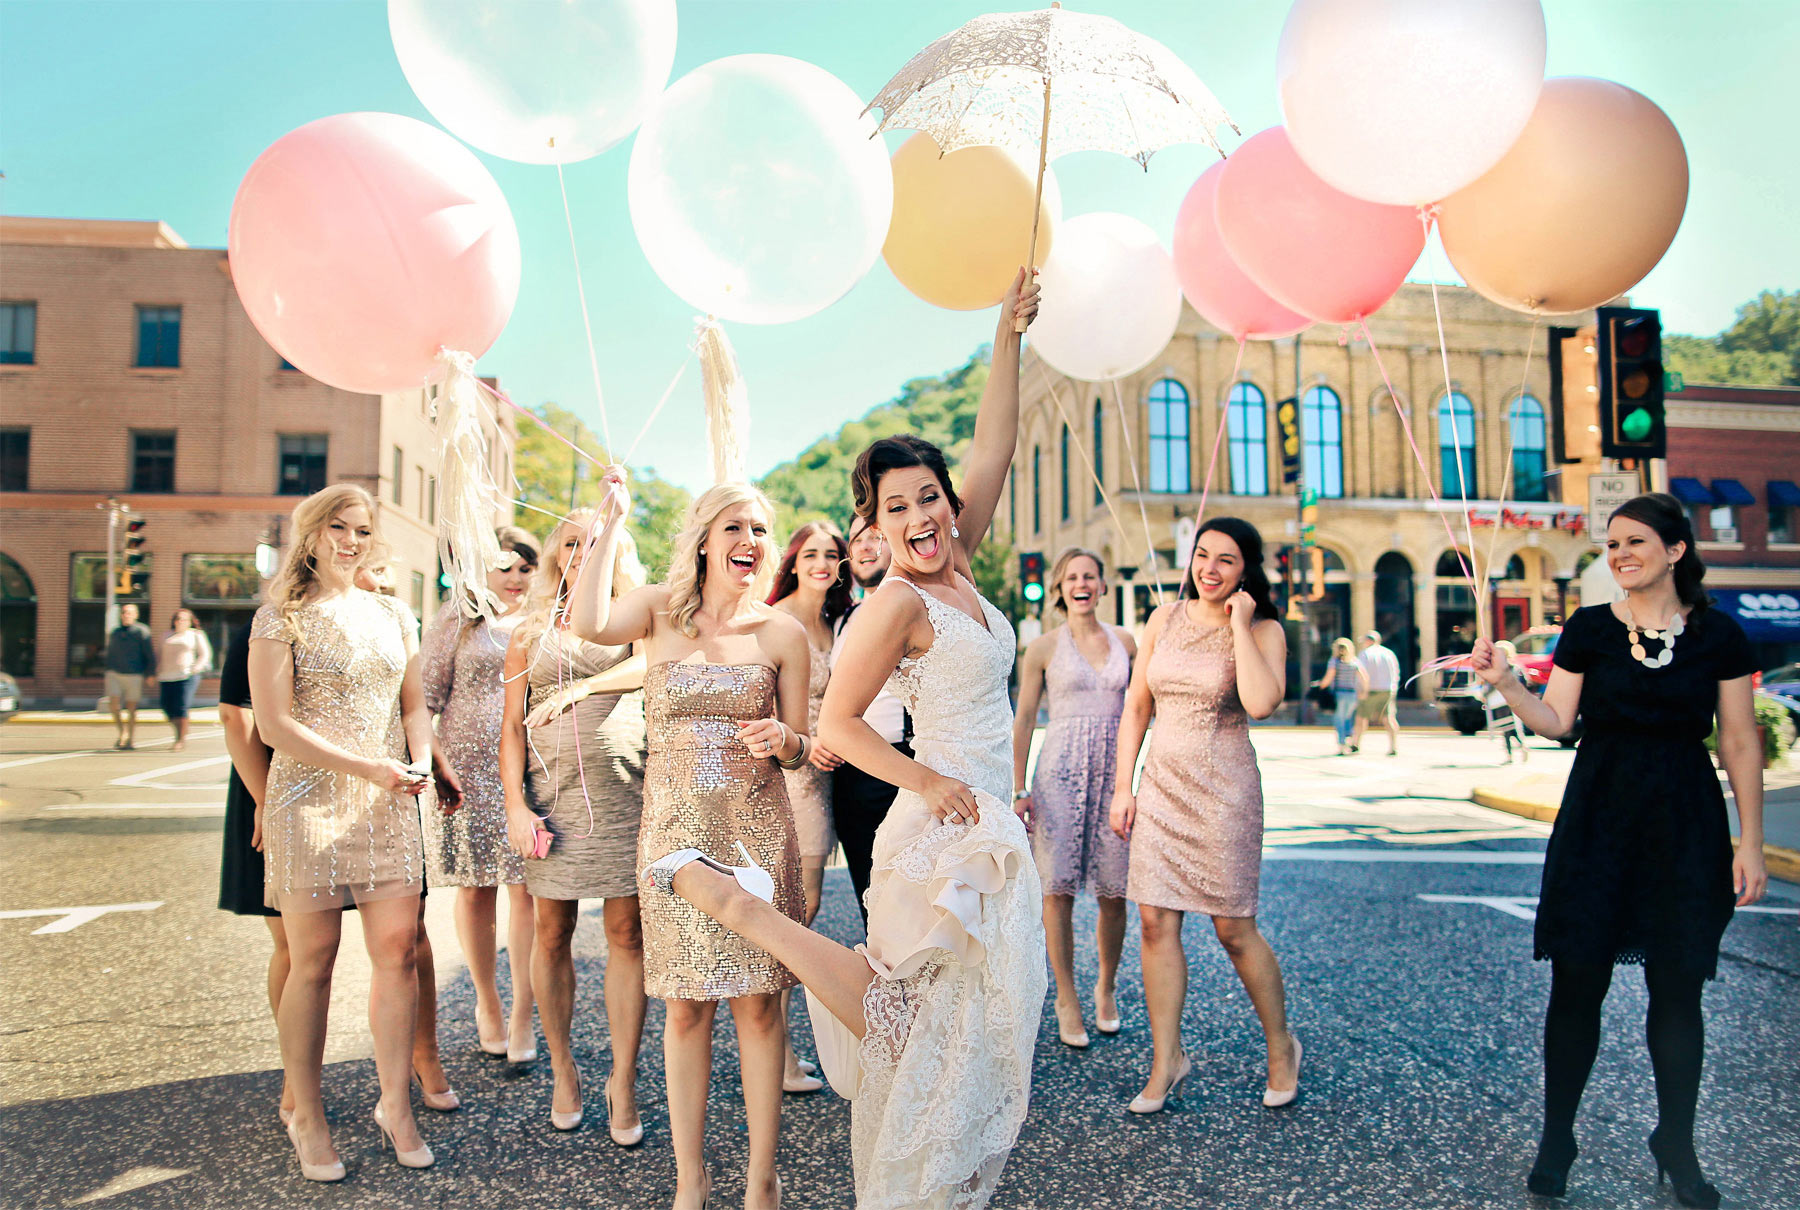 04-Stillwater-Minnesota-Wedding-Photography-by-Vick-Photography-Giant-Balloons-Kick-Up-Your-Heels-Bridesmaids-Tara-&-Ryan.jpg